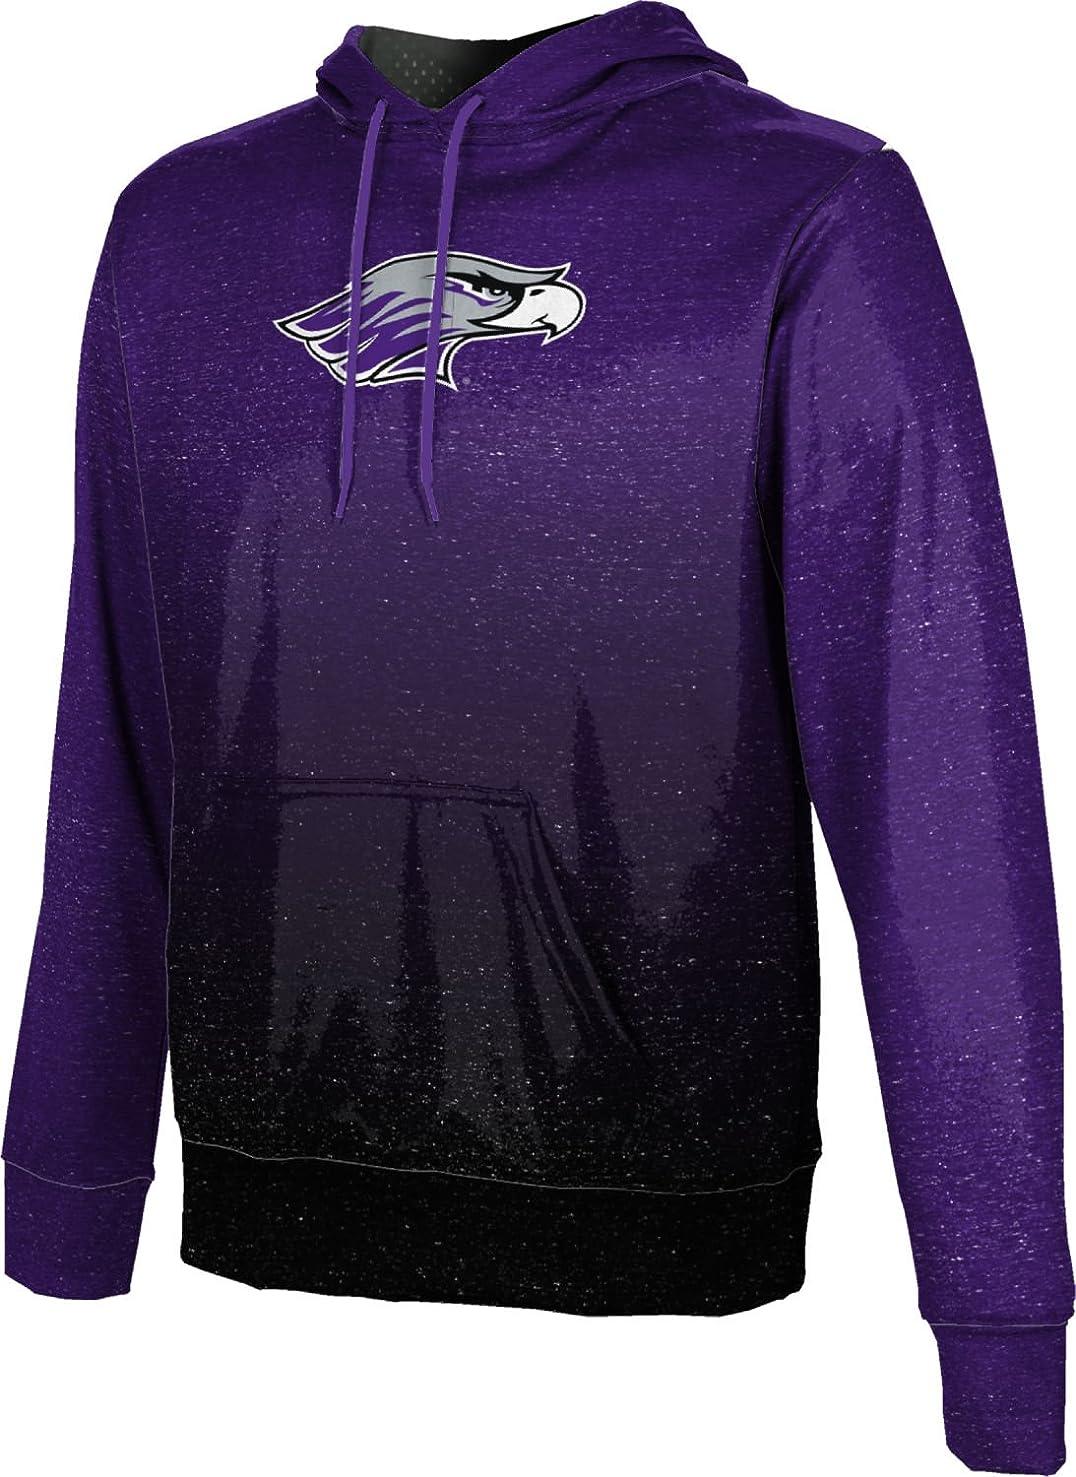 ProSphere University of Wisconsin-Whitewater College Boys' Pullover Hoodie, School Spirit Sweatshirt (Ombre)